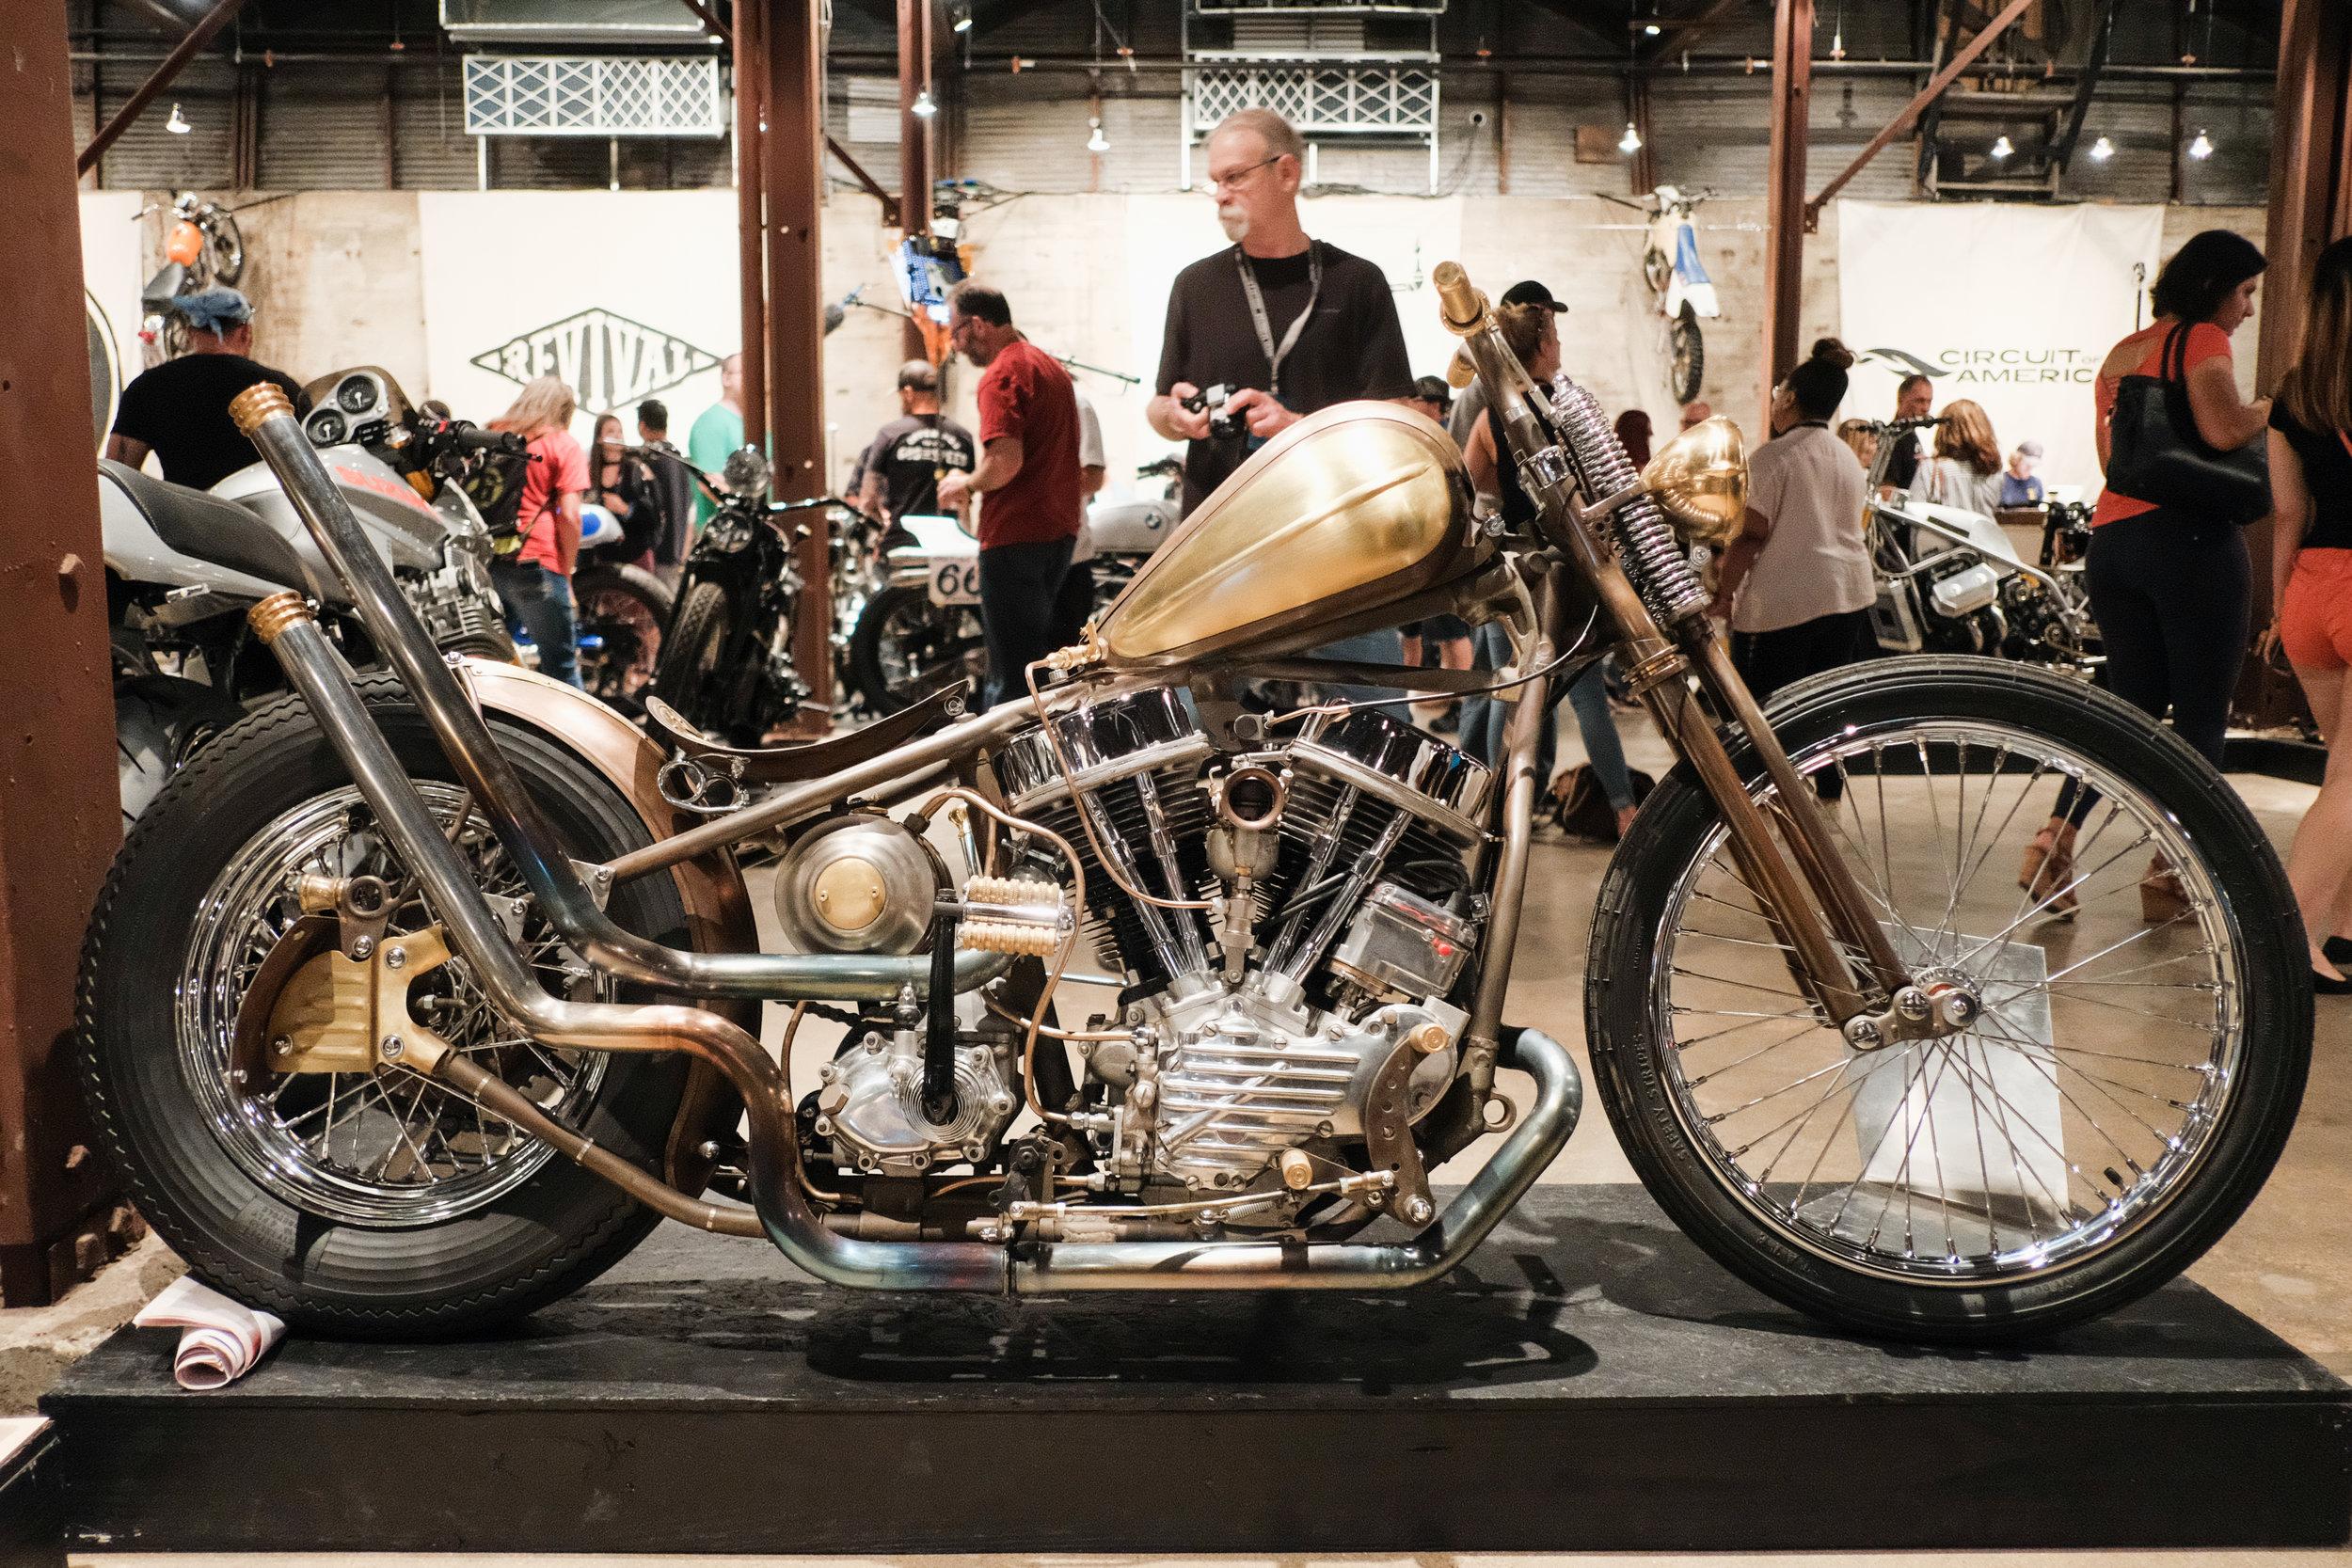 Handbuilt-Motorcycle-Show-2017-8510.jpg